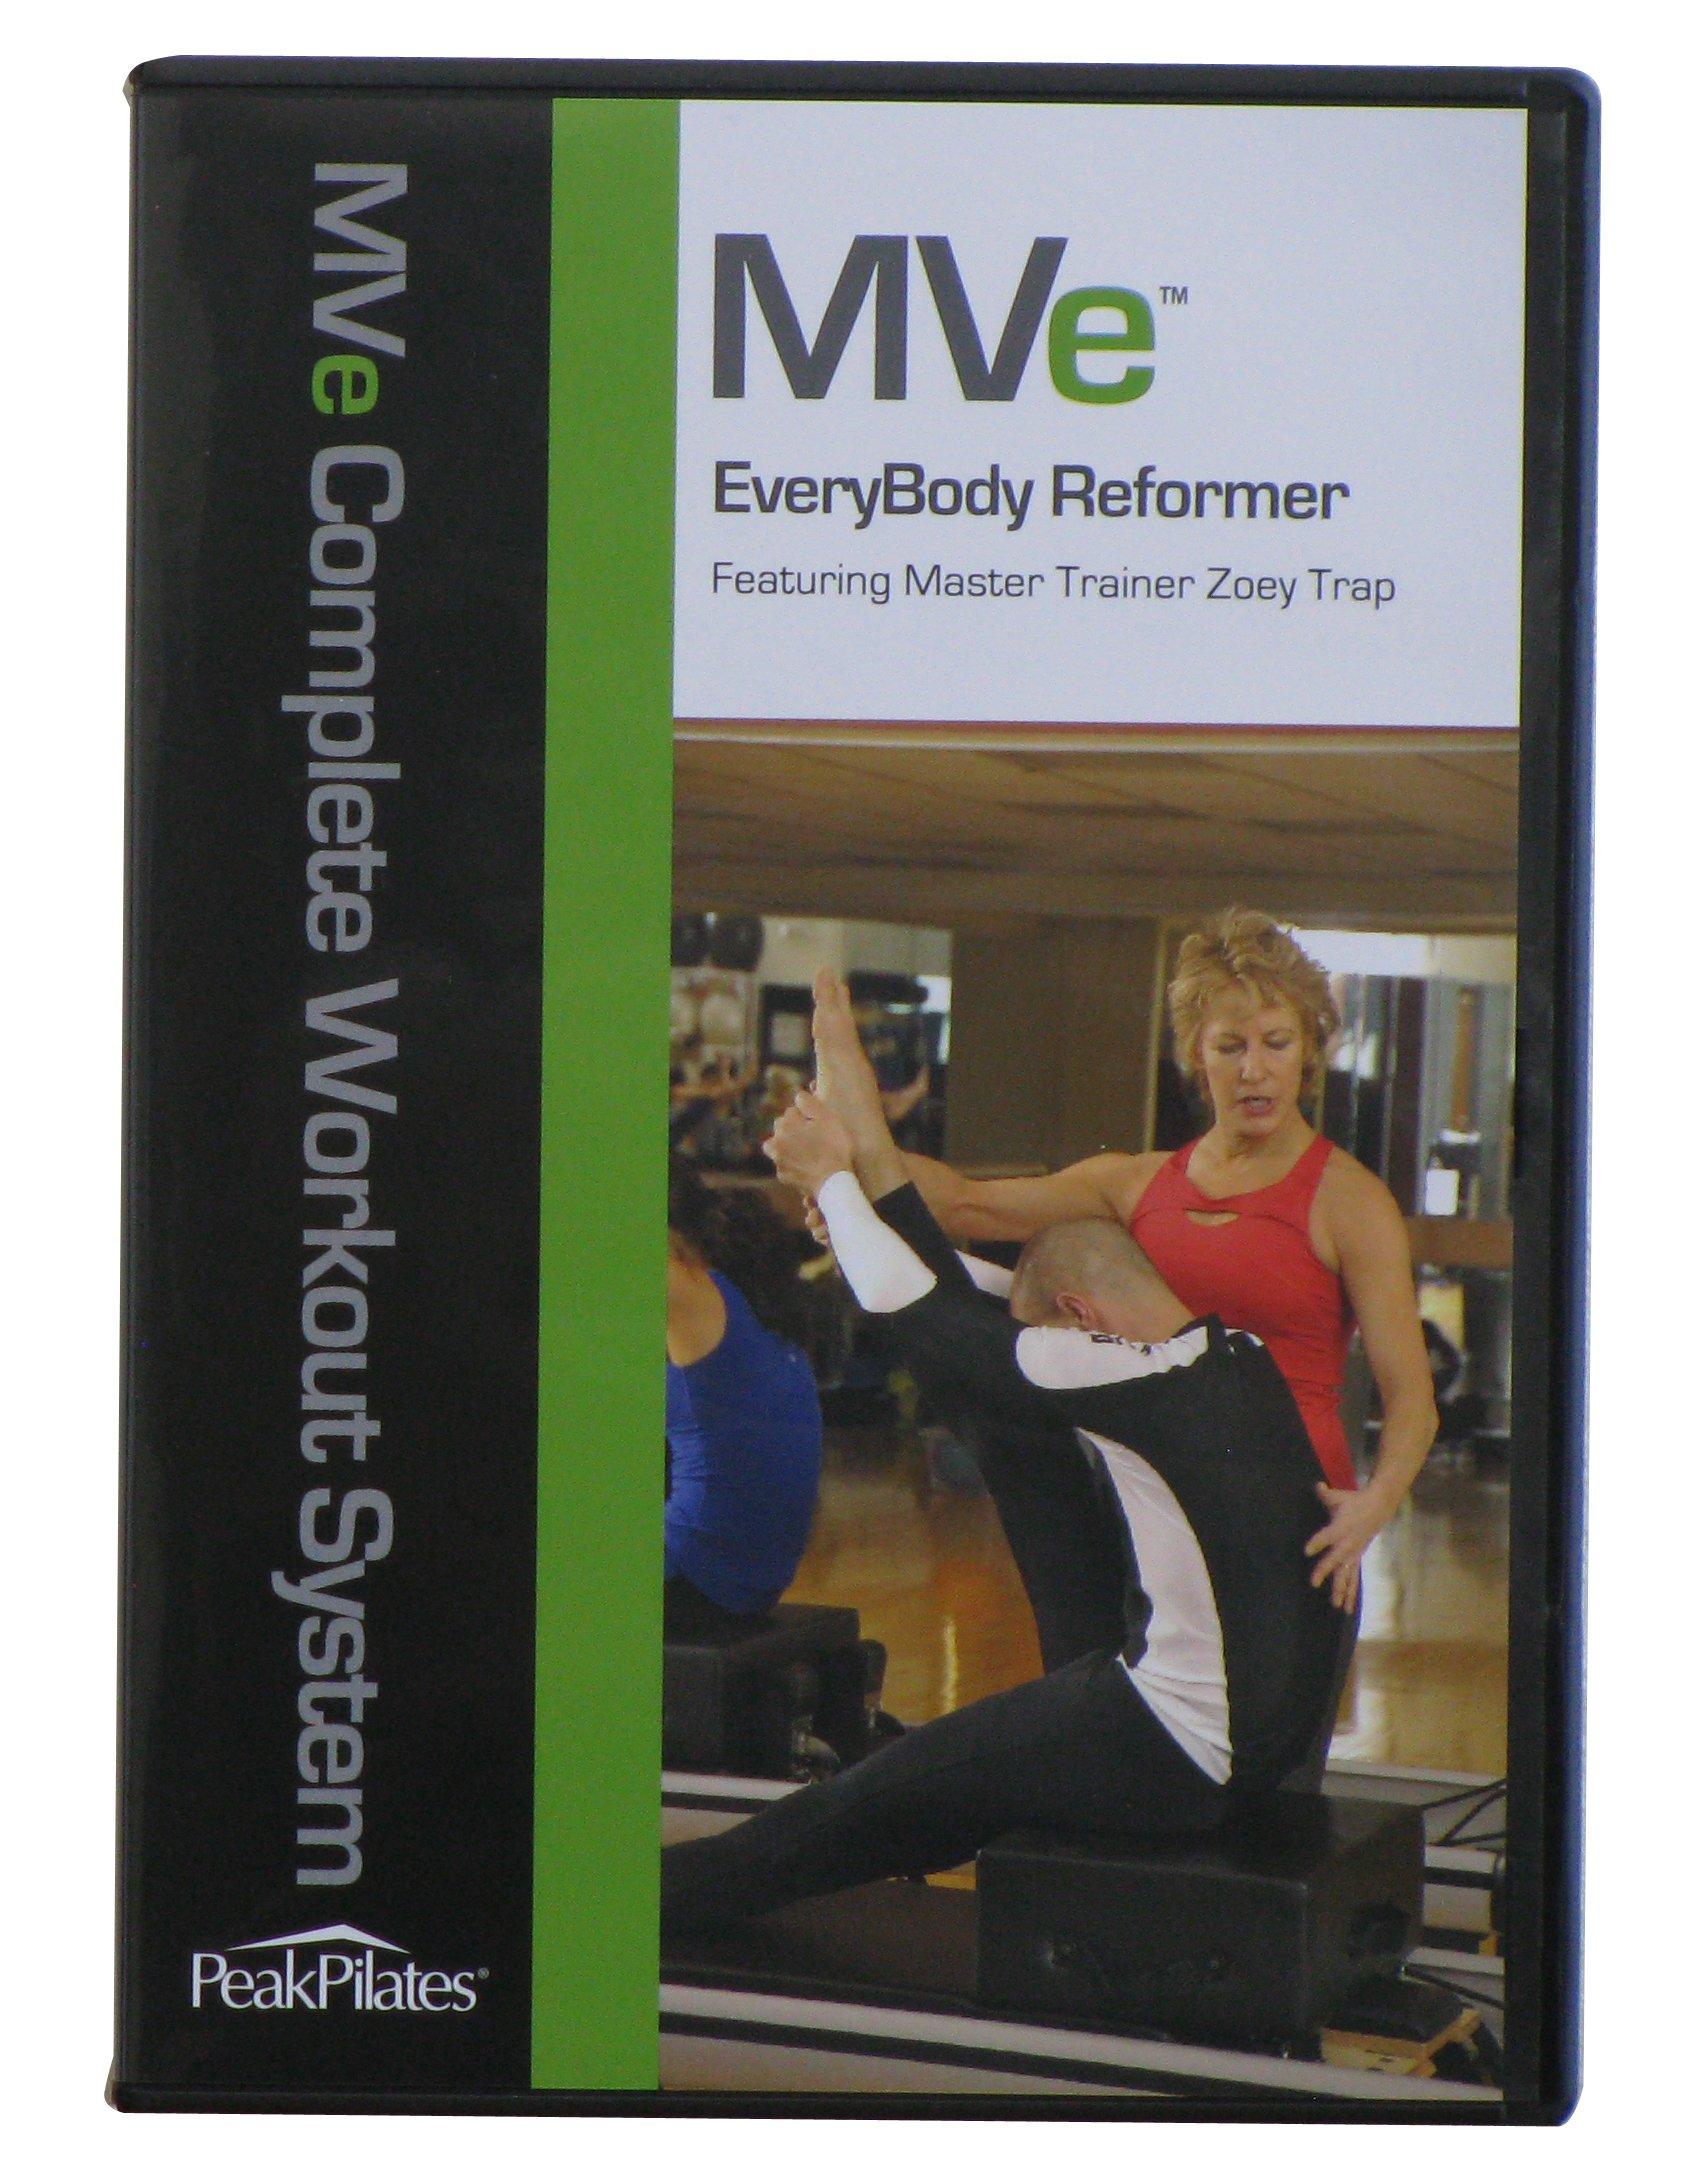 Peak Pilates� Mve� Everybody Reformer Workout DVD